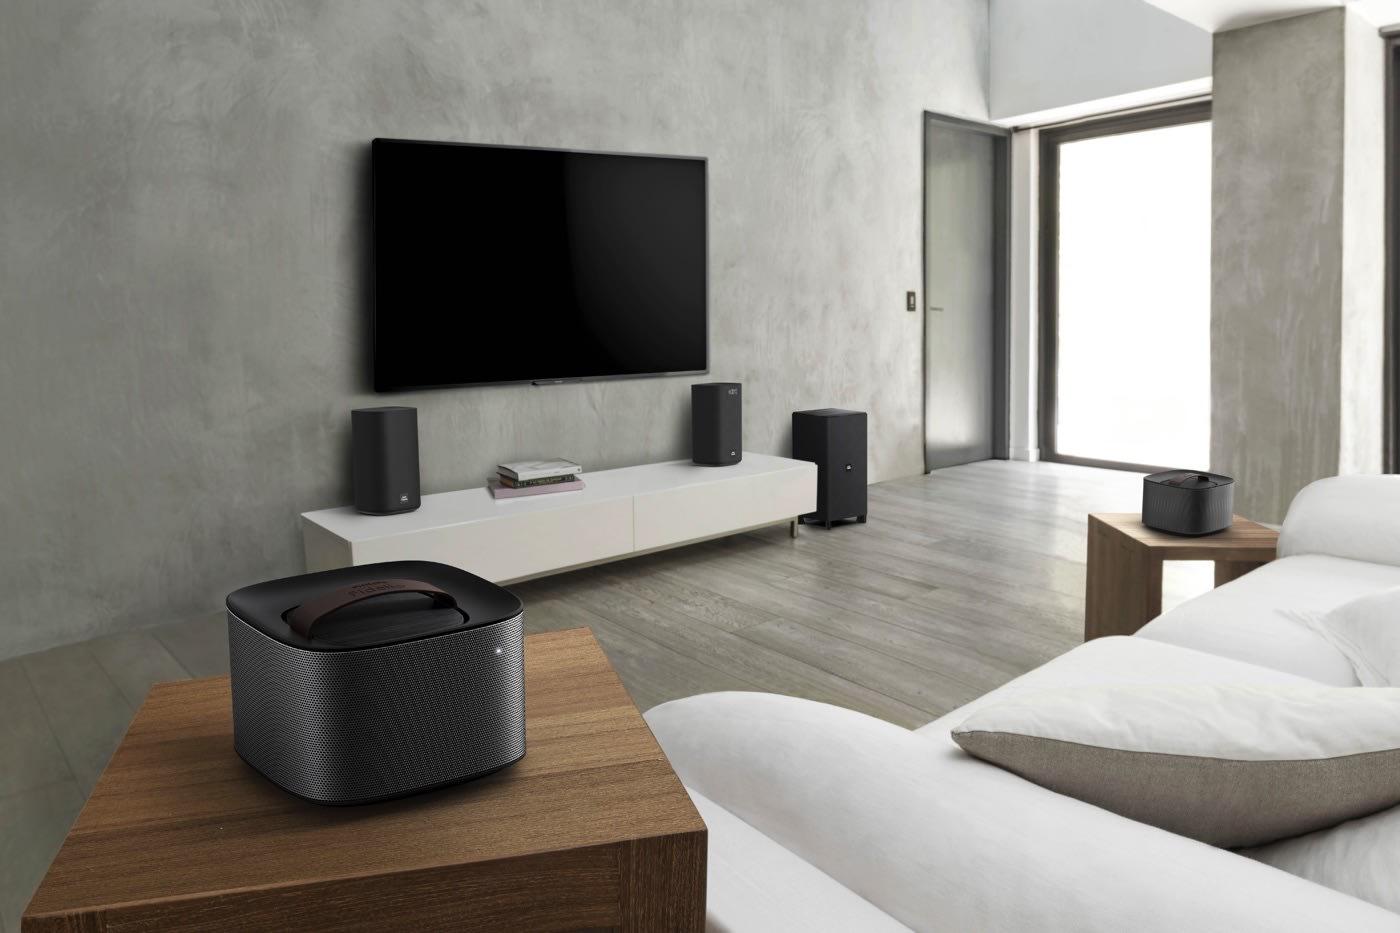 Philips Living Room Audio Gear Includes Detachable Speakers